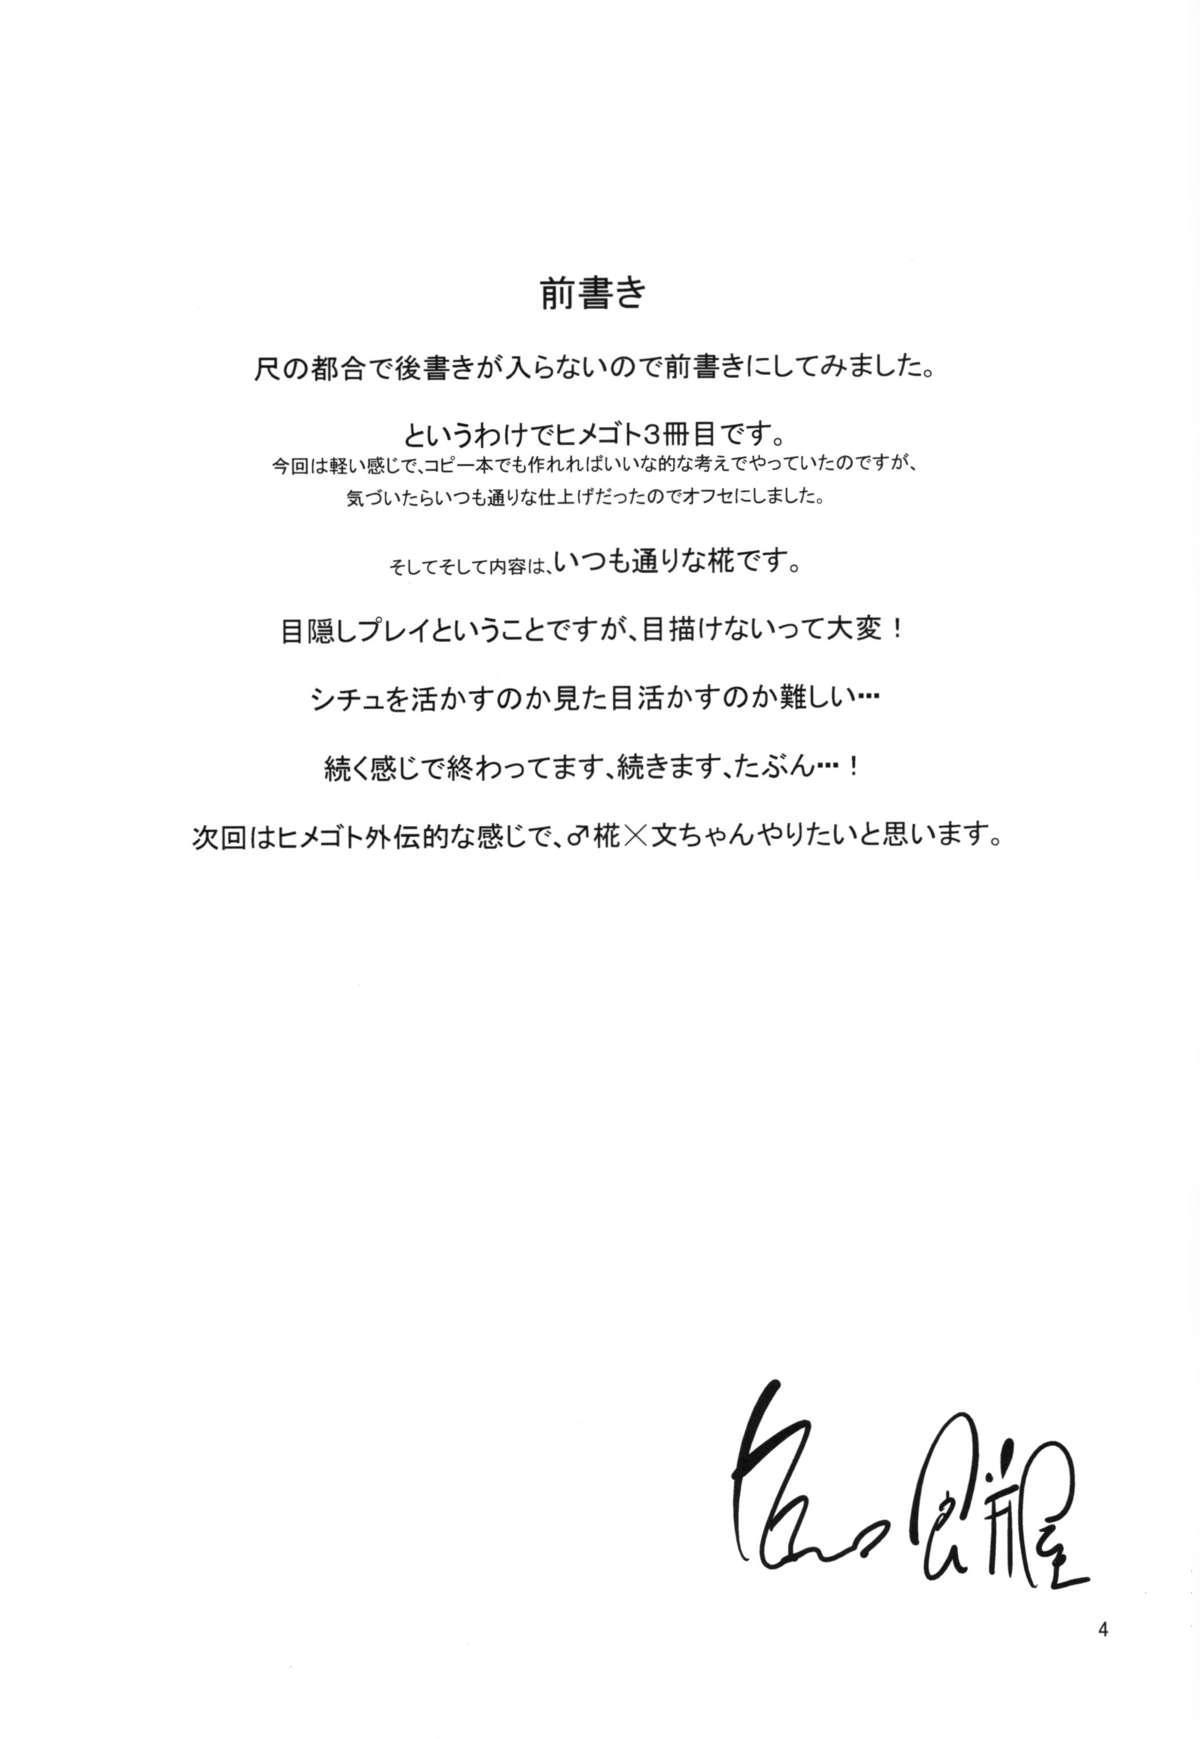 Himegoto 2.5 2